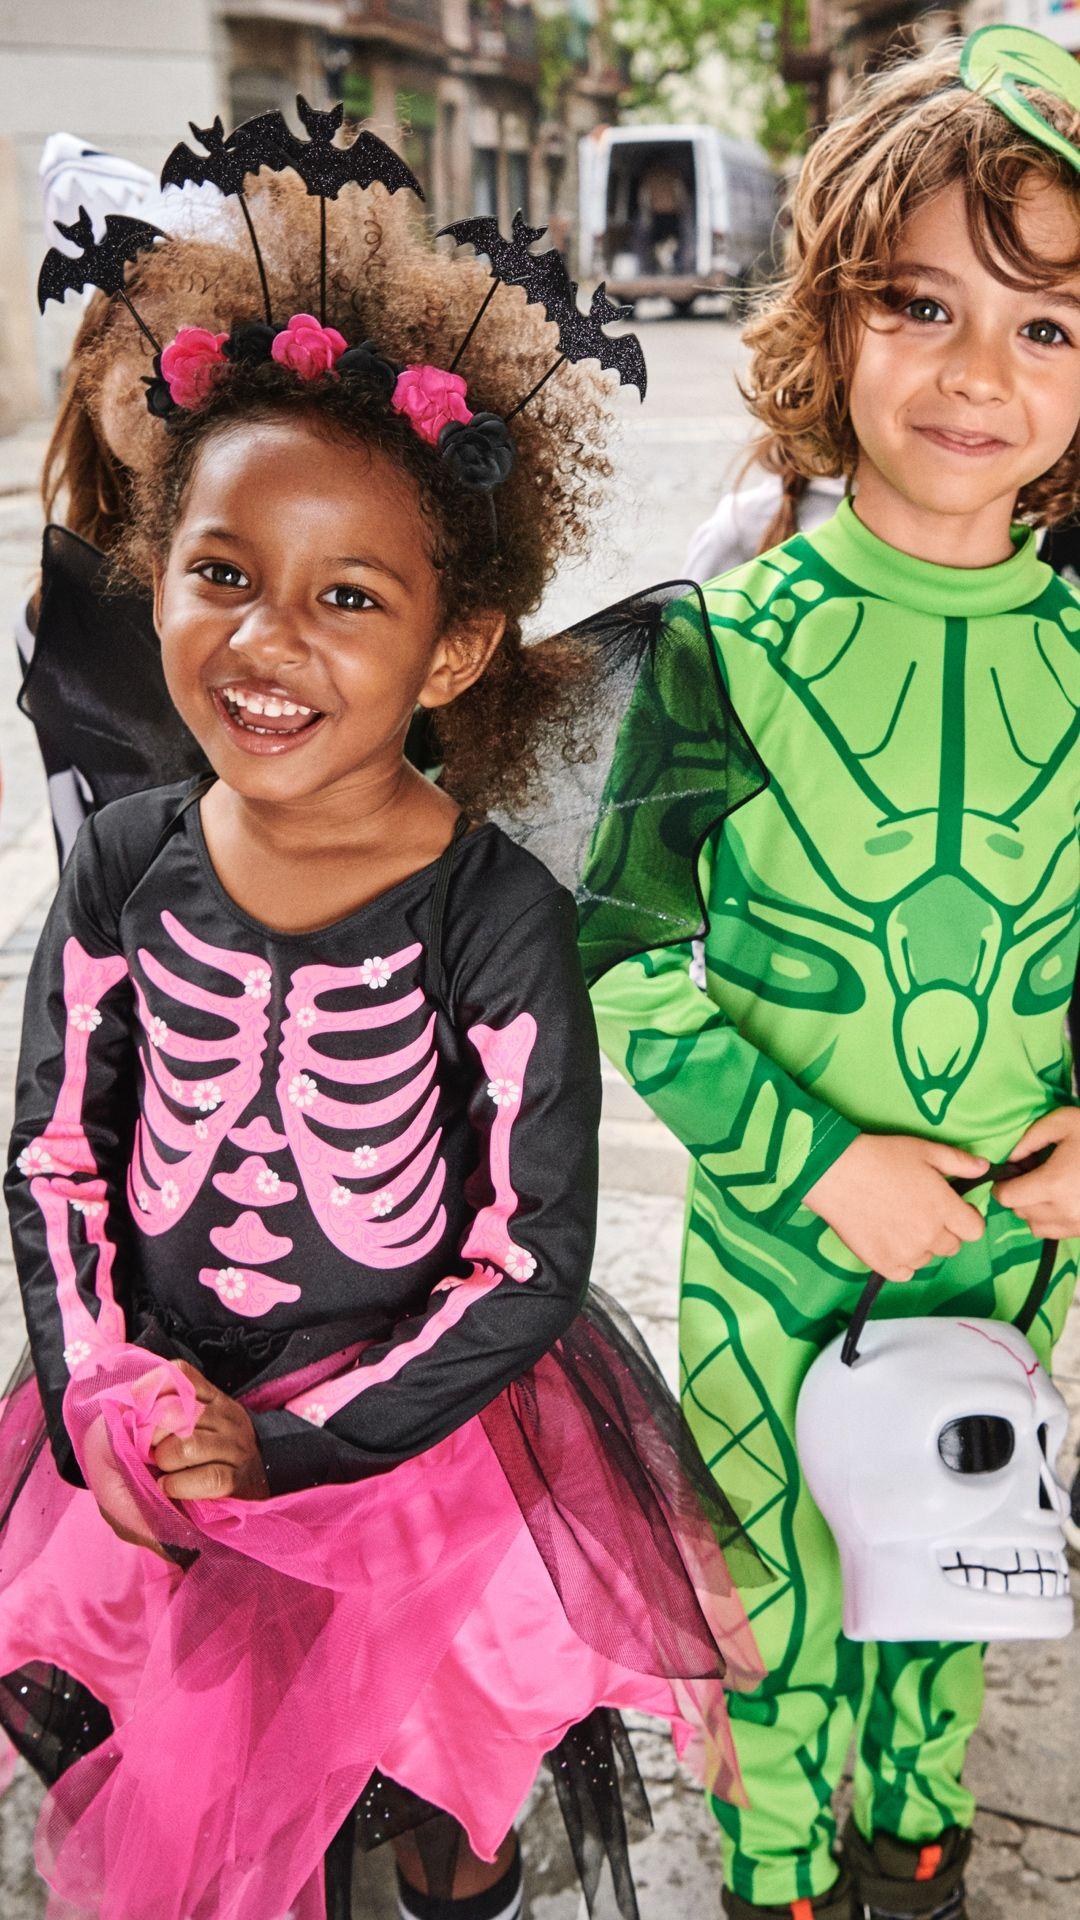 costume in 2018 | h&m kids | pinterest | halloween, halloween